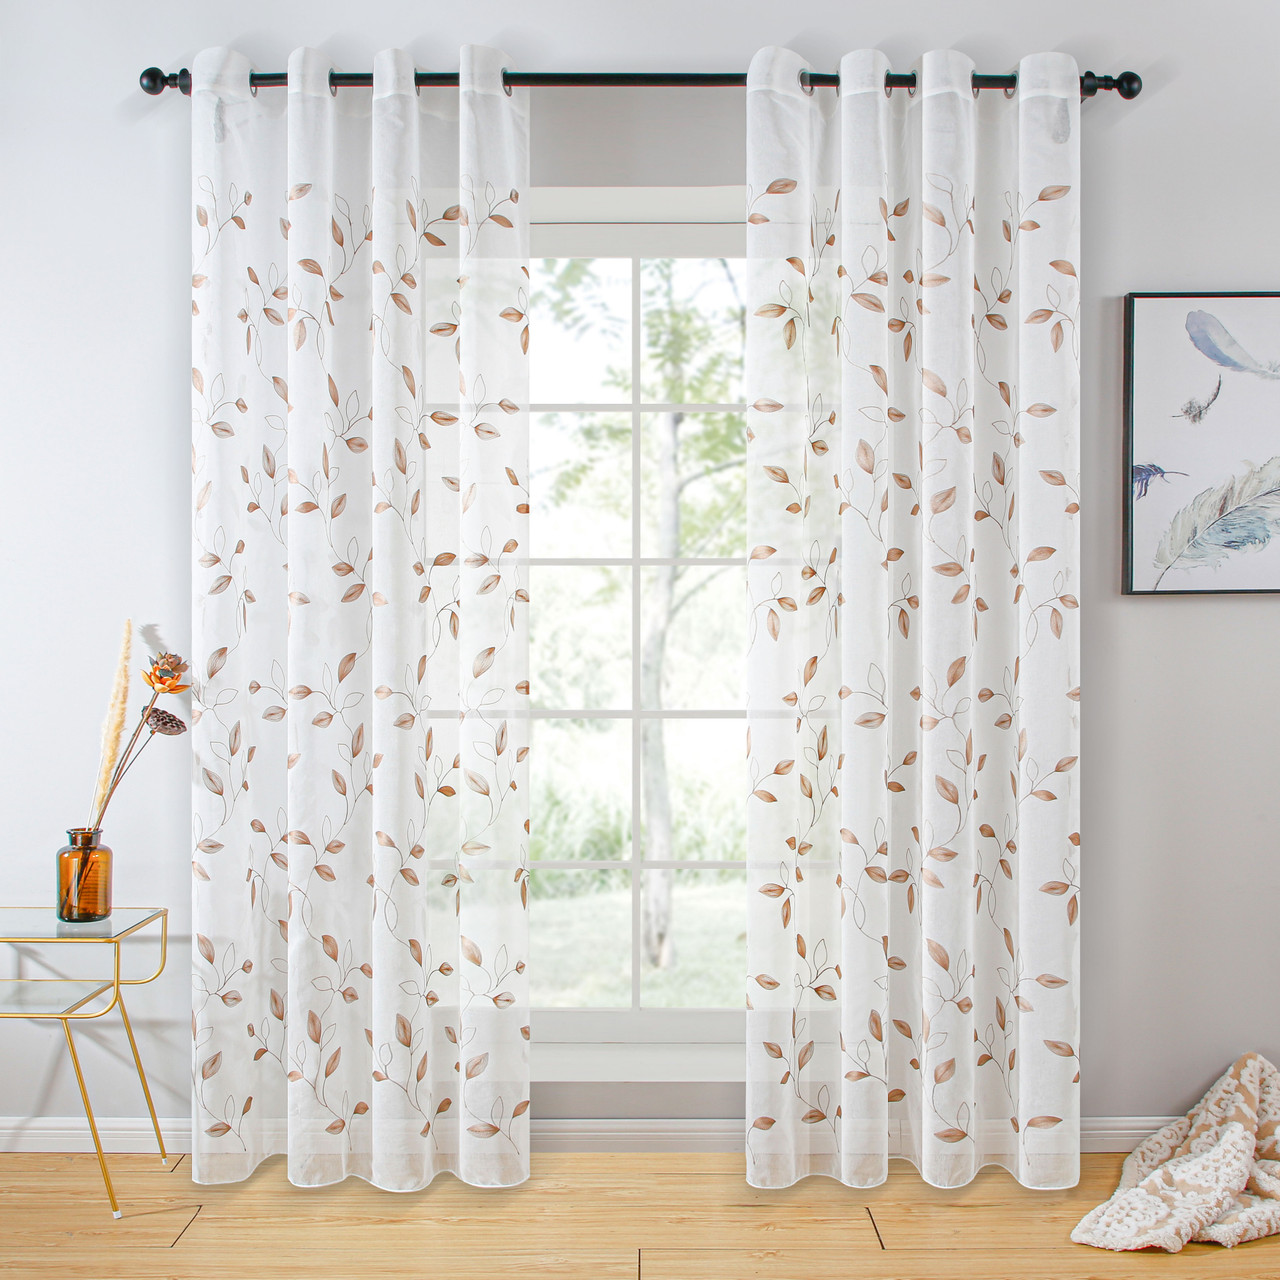 Sheer Curtain Panel White Window Treatments - Dolce Mela - Valencia - DMC729